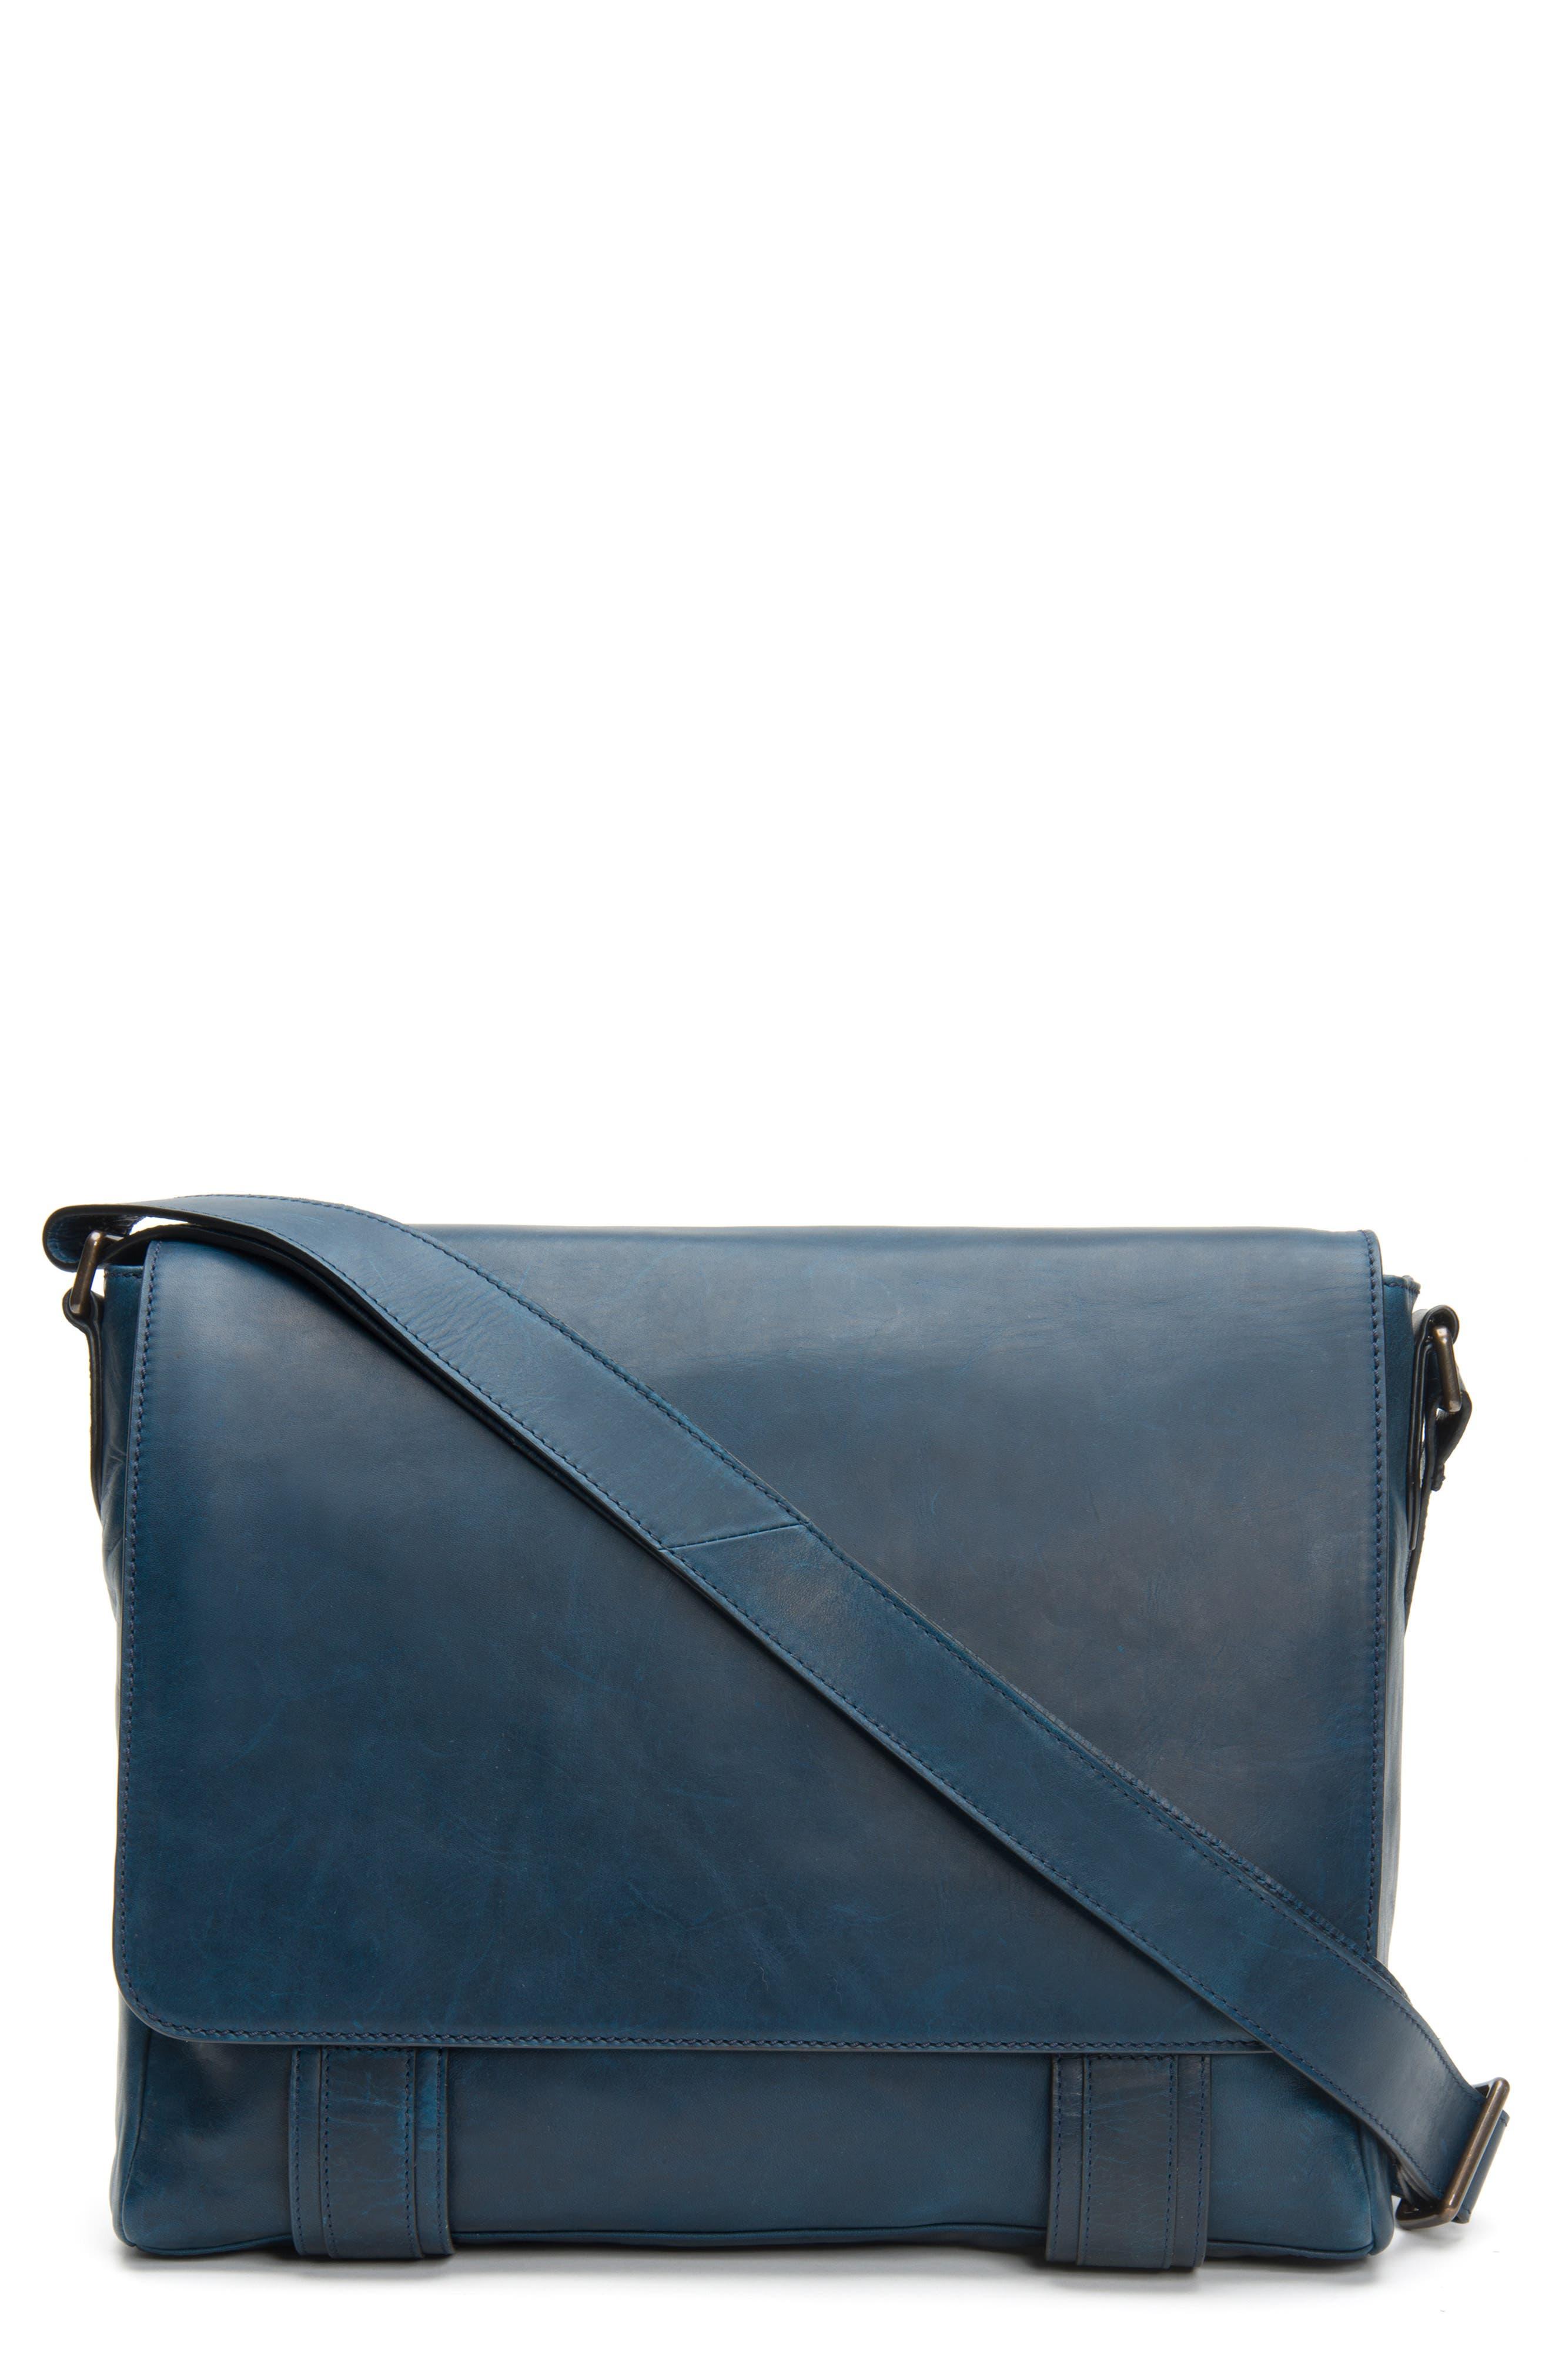 'Logan' Messenger Bag,                         Main,                         color, NAVY